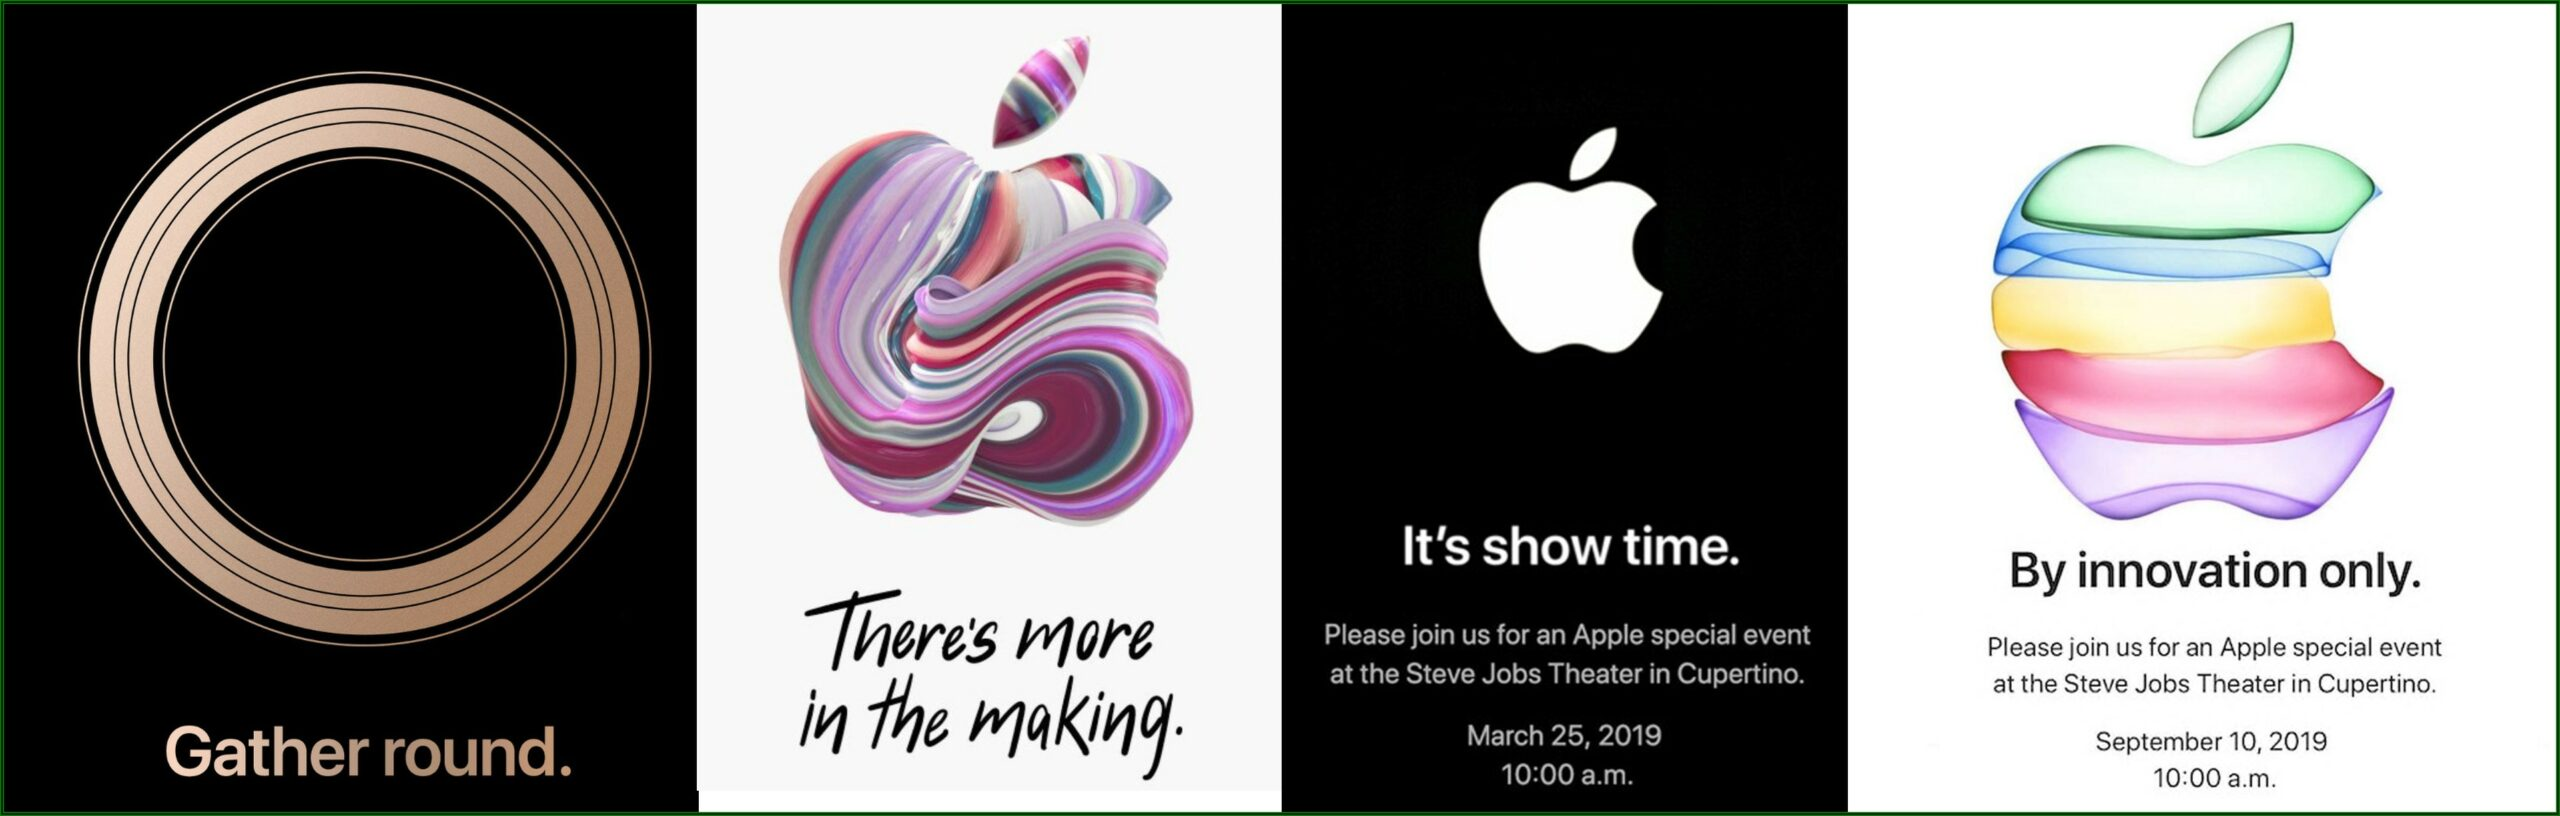 Apple Announcement Date 2019